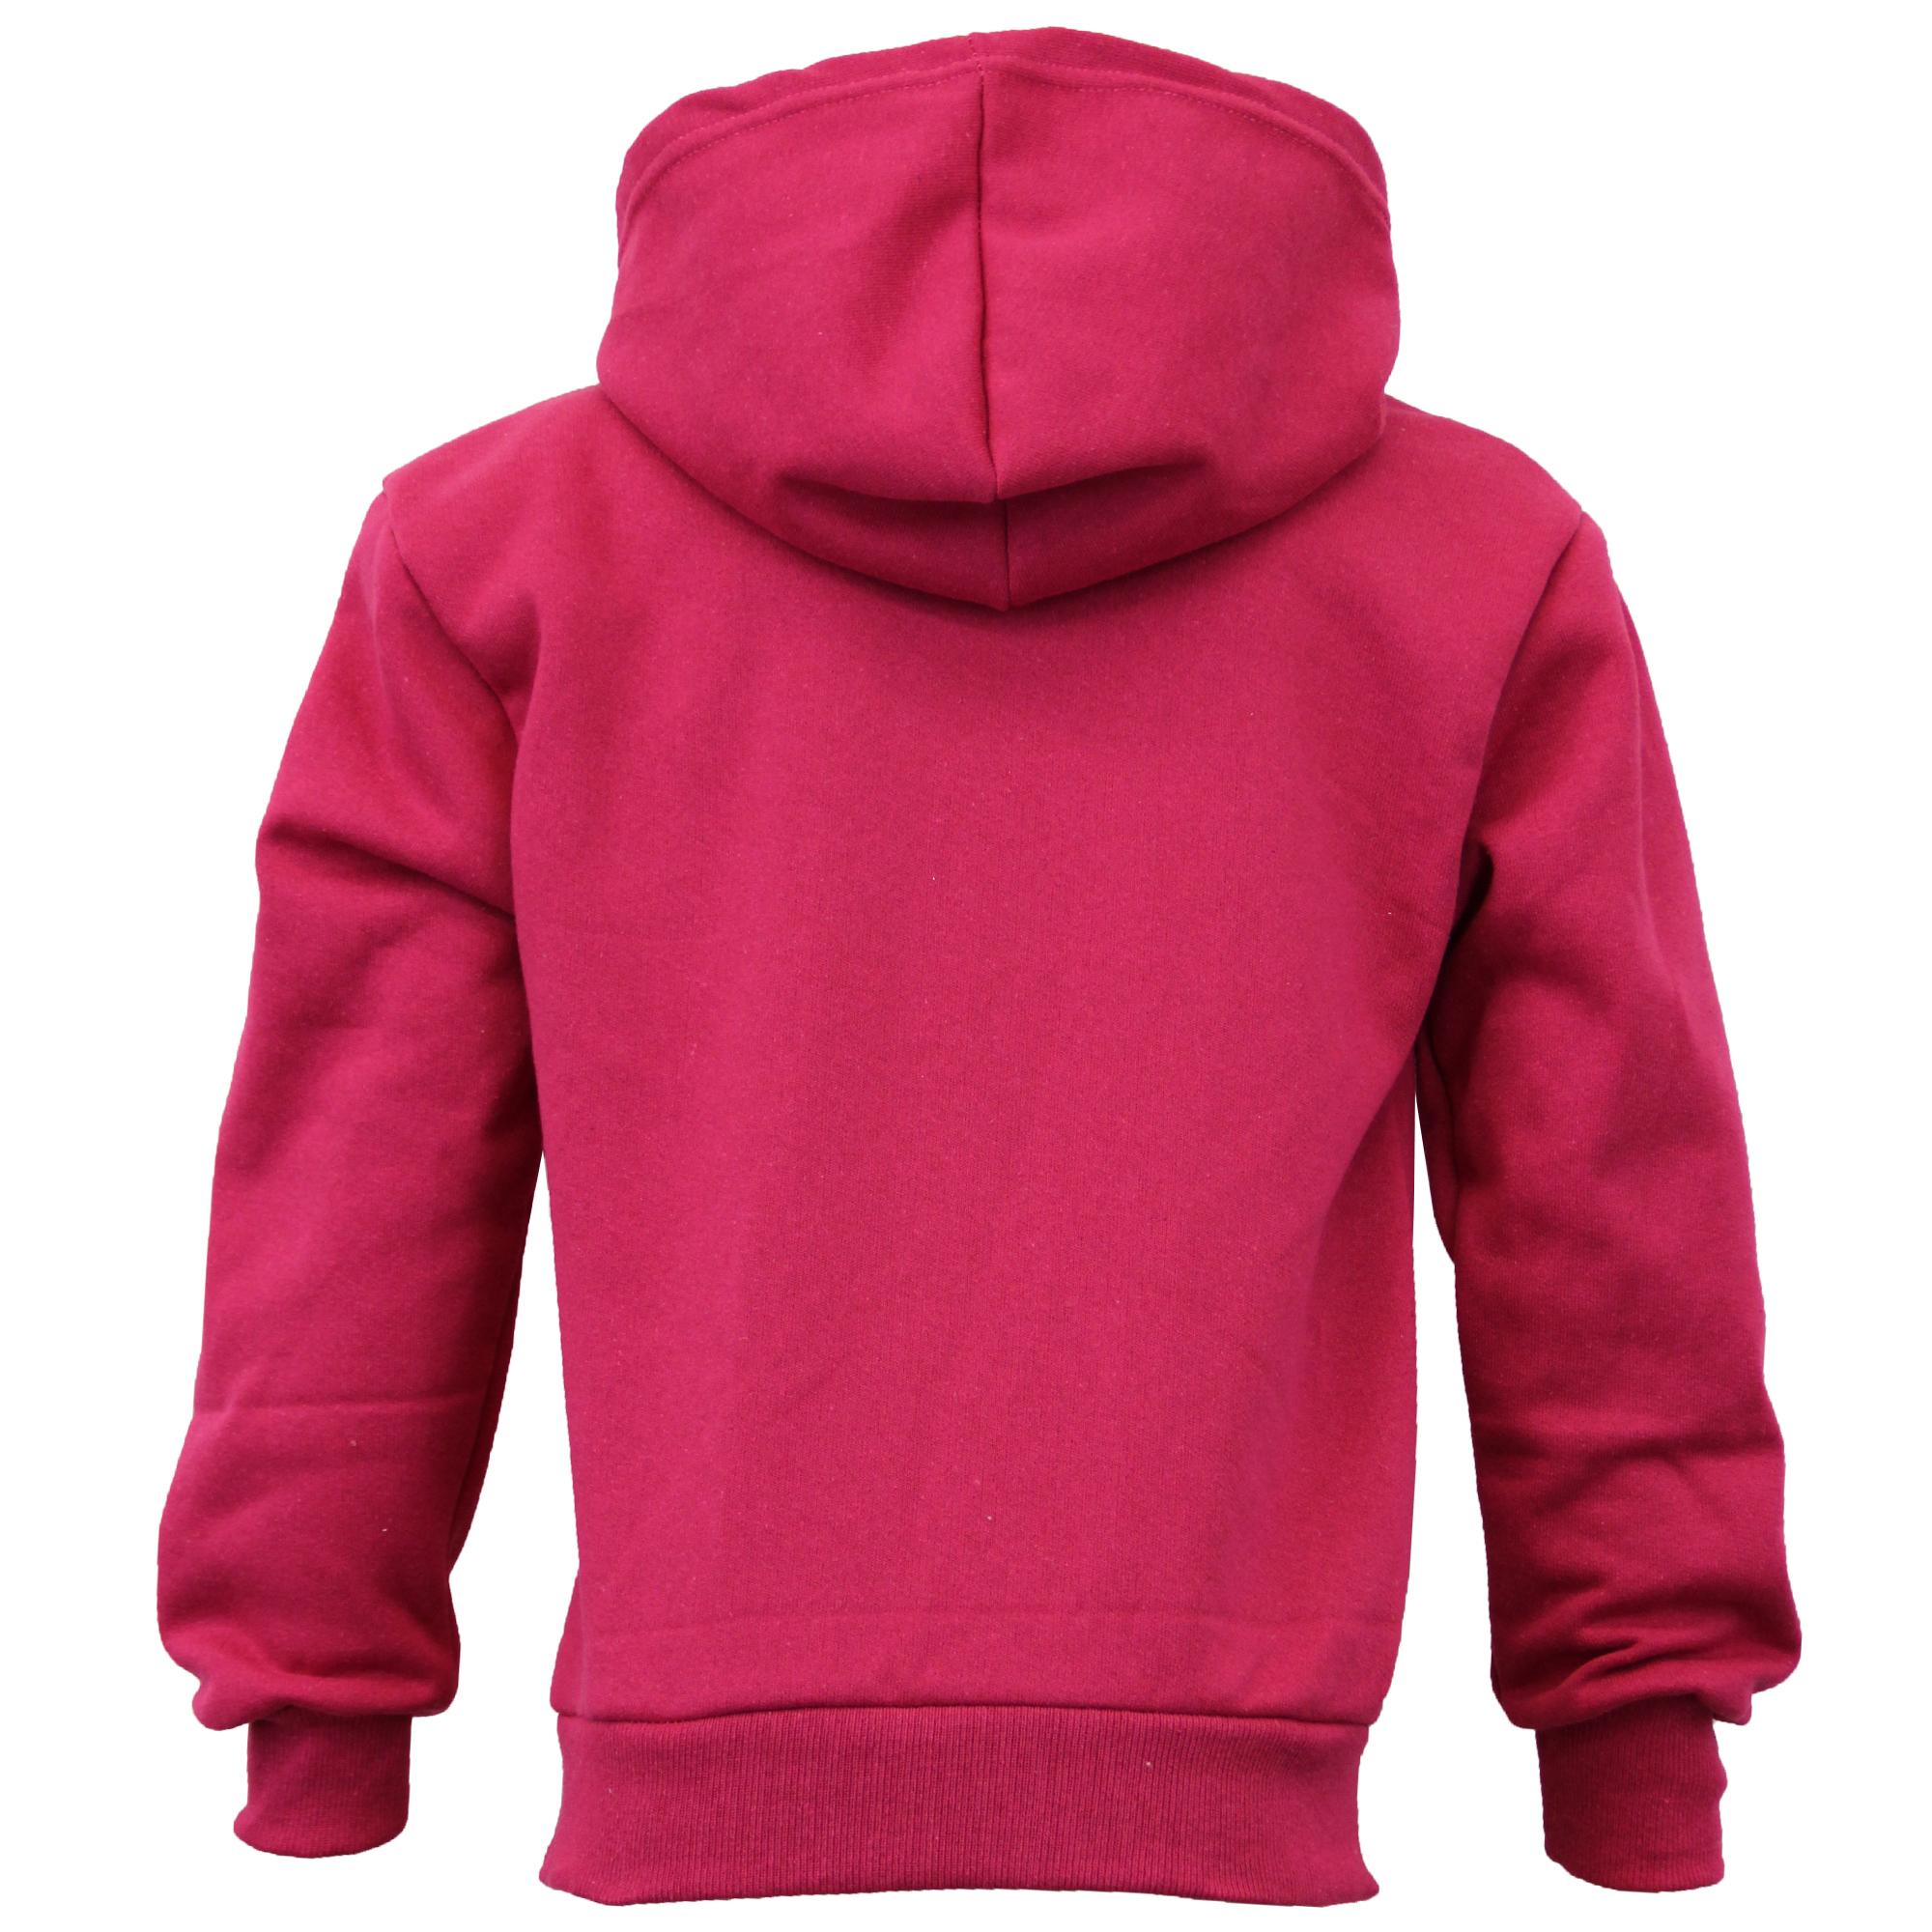 Girls One Direction Sweatshirt Kids Hooded 1D Top Pullover ...